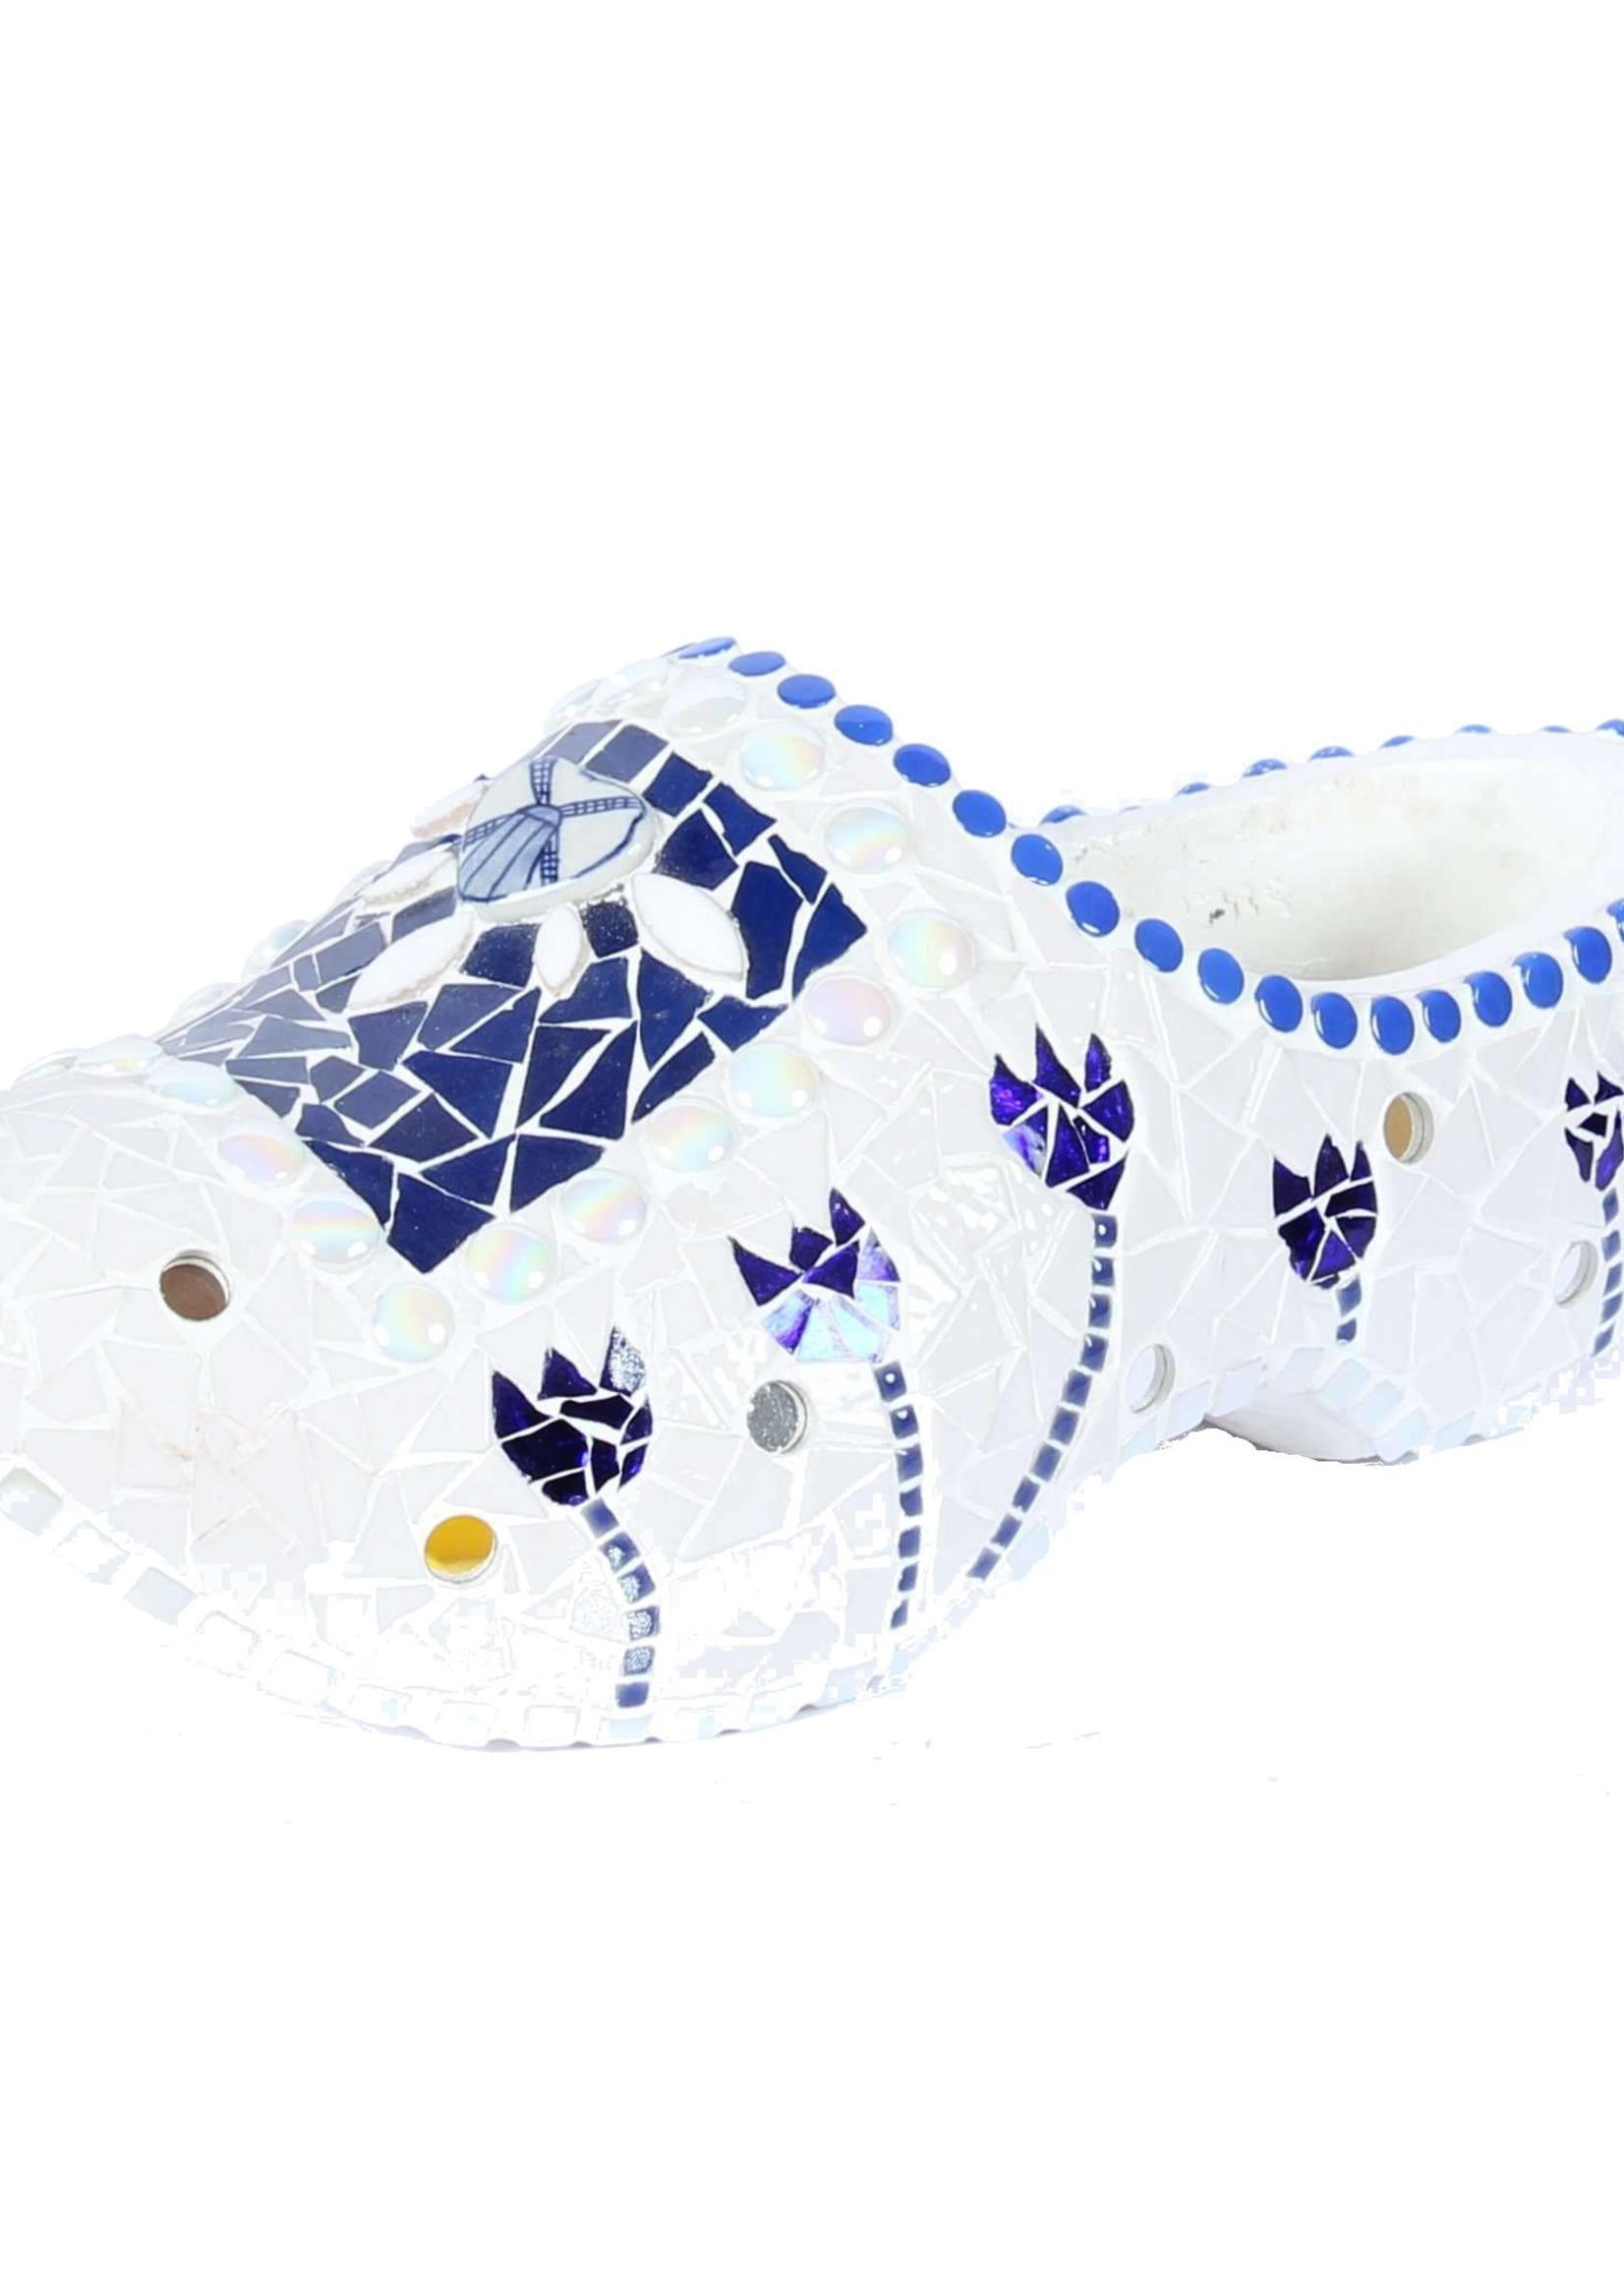 Blauw Witte Mozaiek Kunst Klomp, Handgemaakt